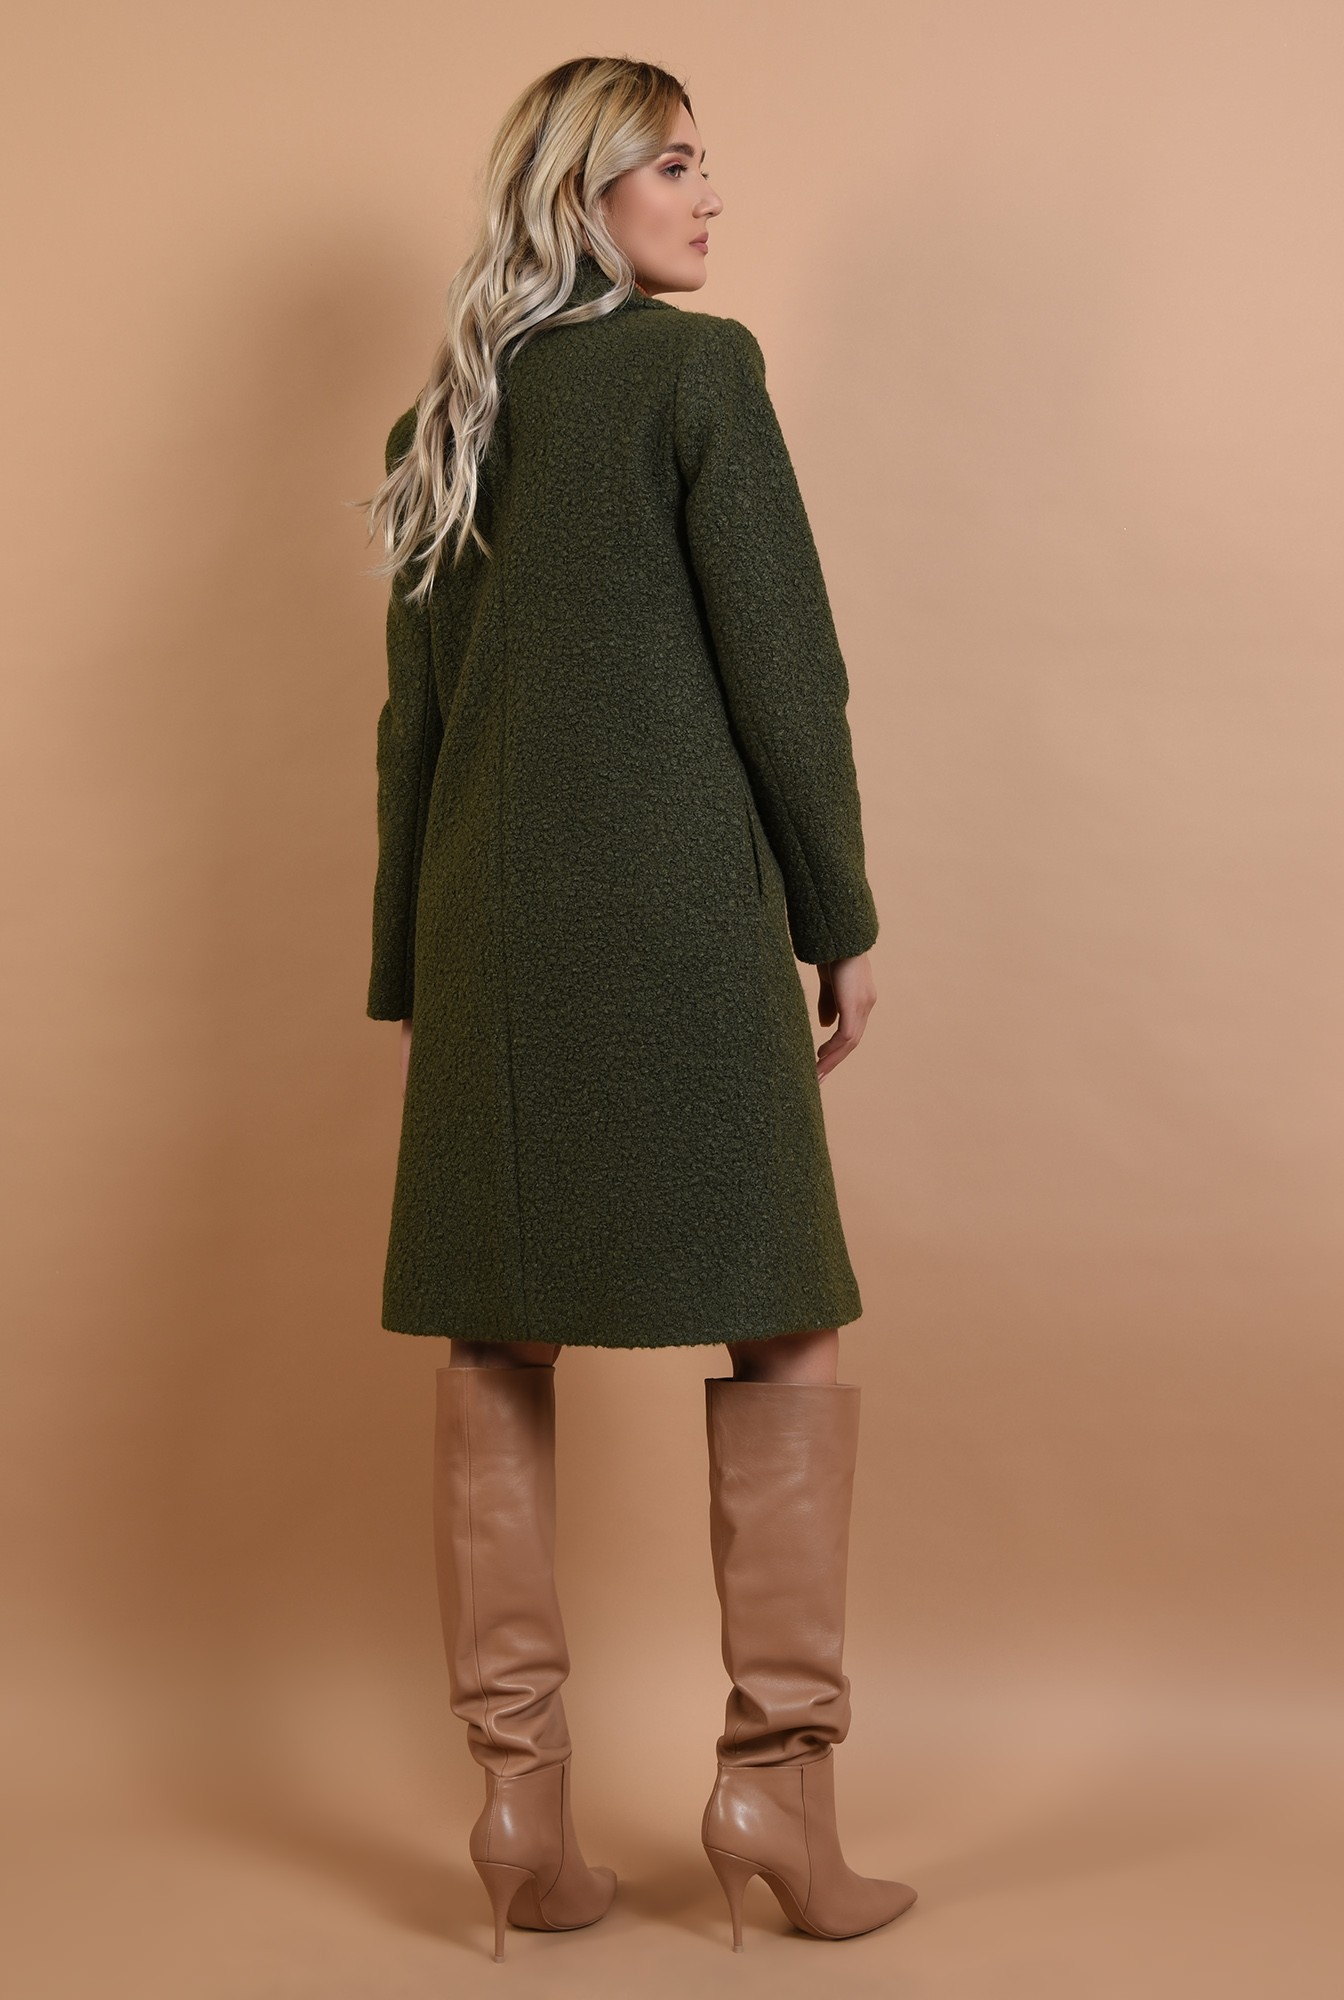 1 - palton kaki, cu nasture, cu revere, lana buclata